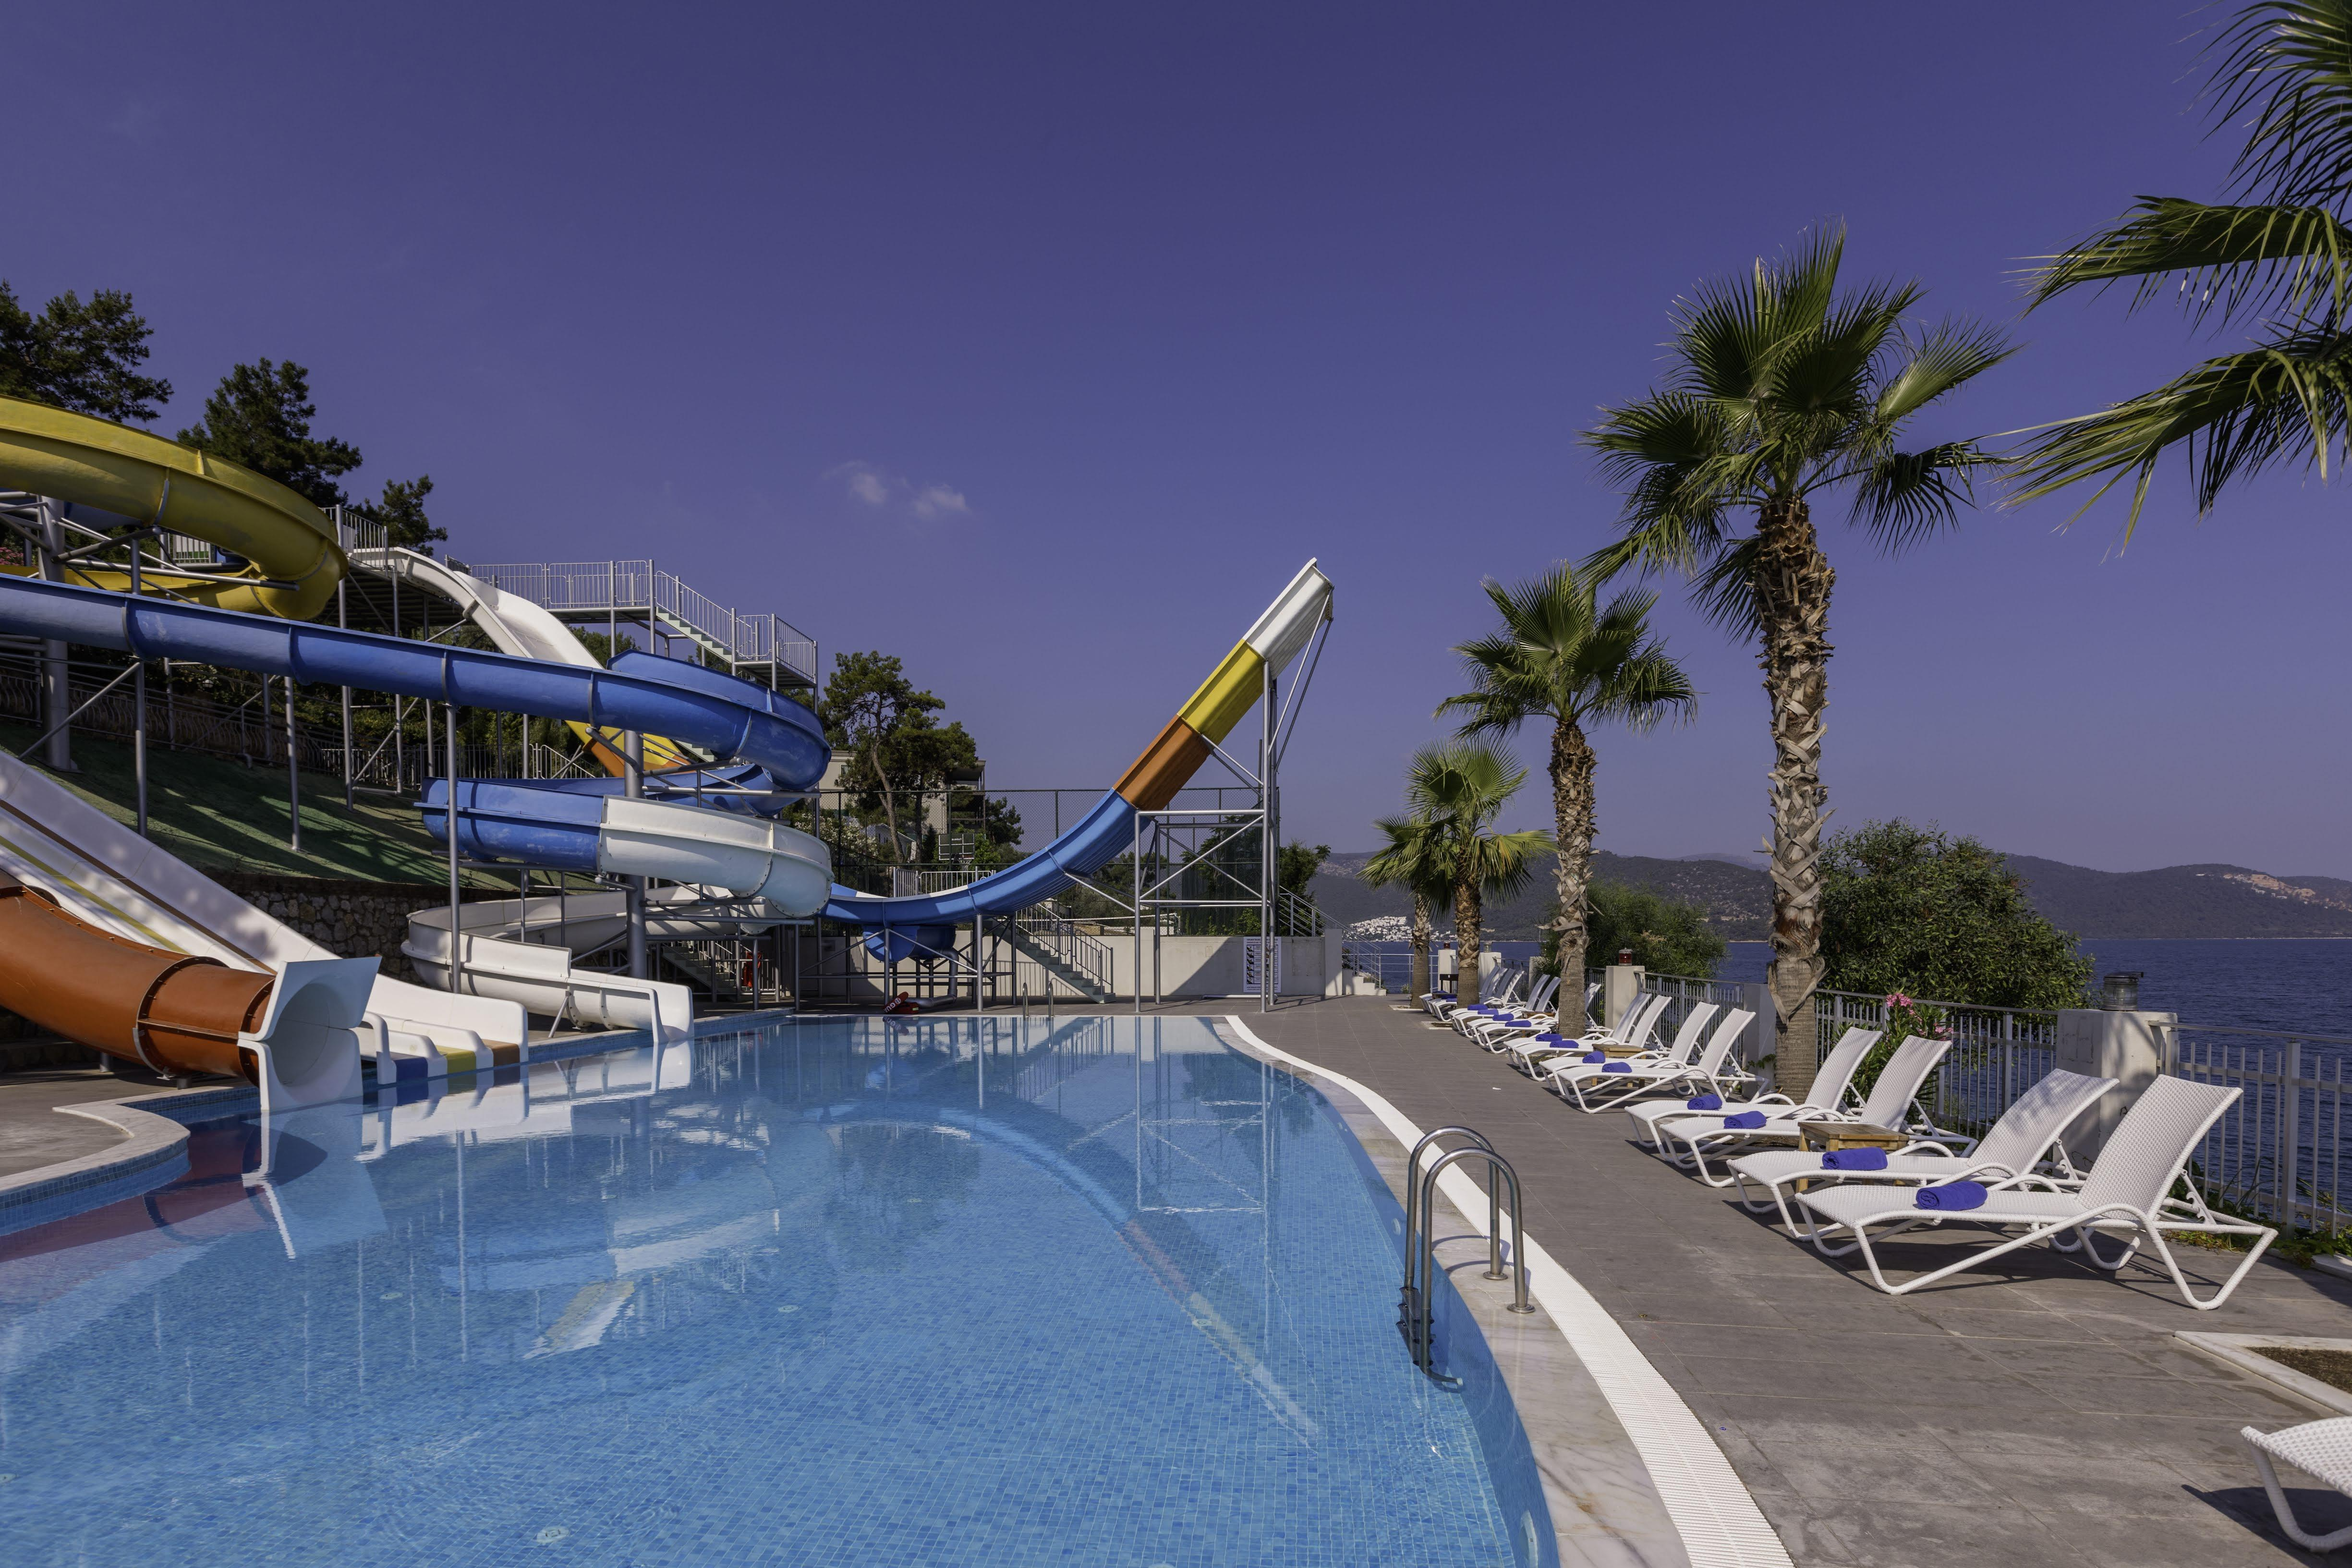 kairaba-blue-dreams-club-hotel-genel-0029